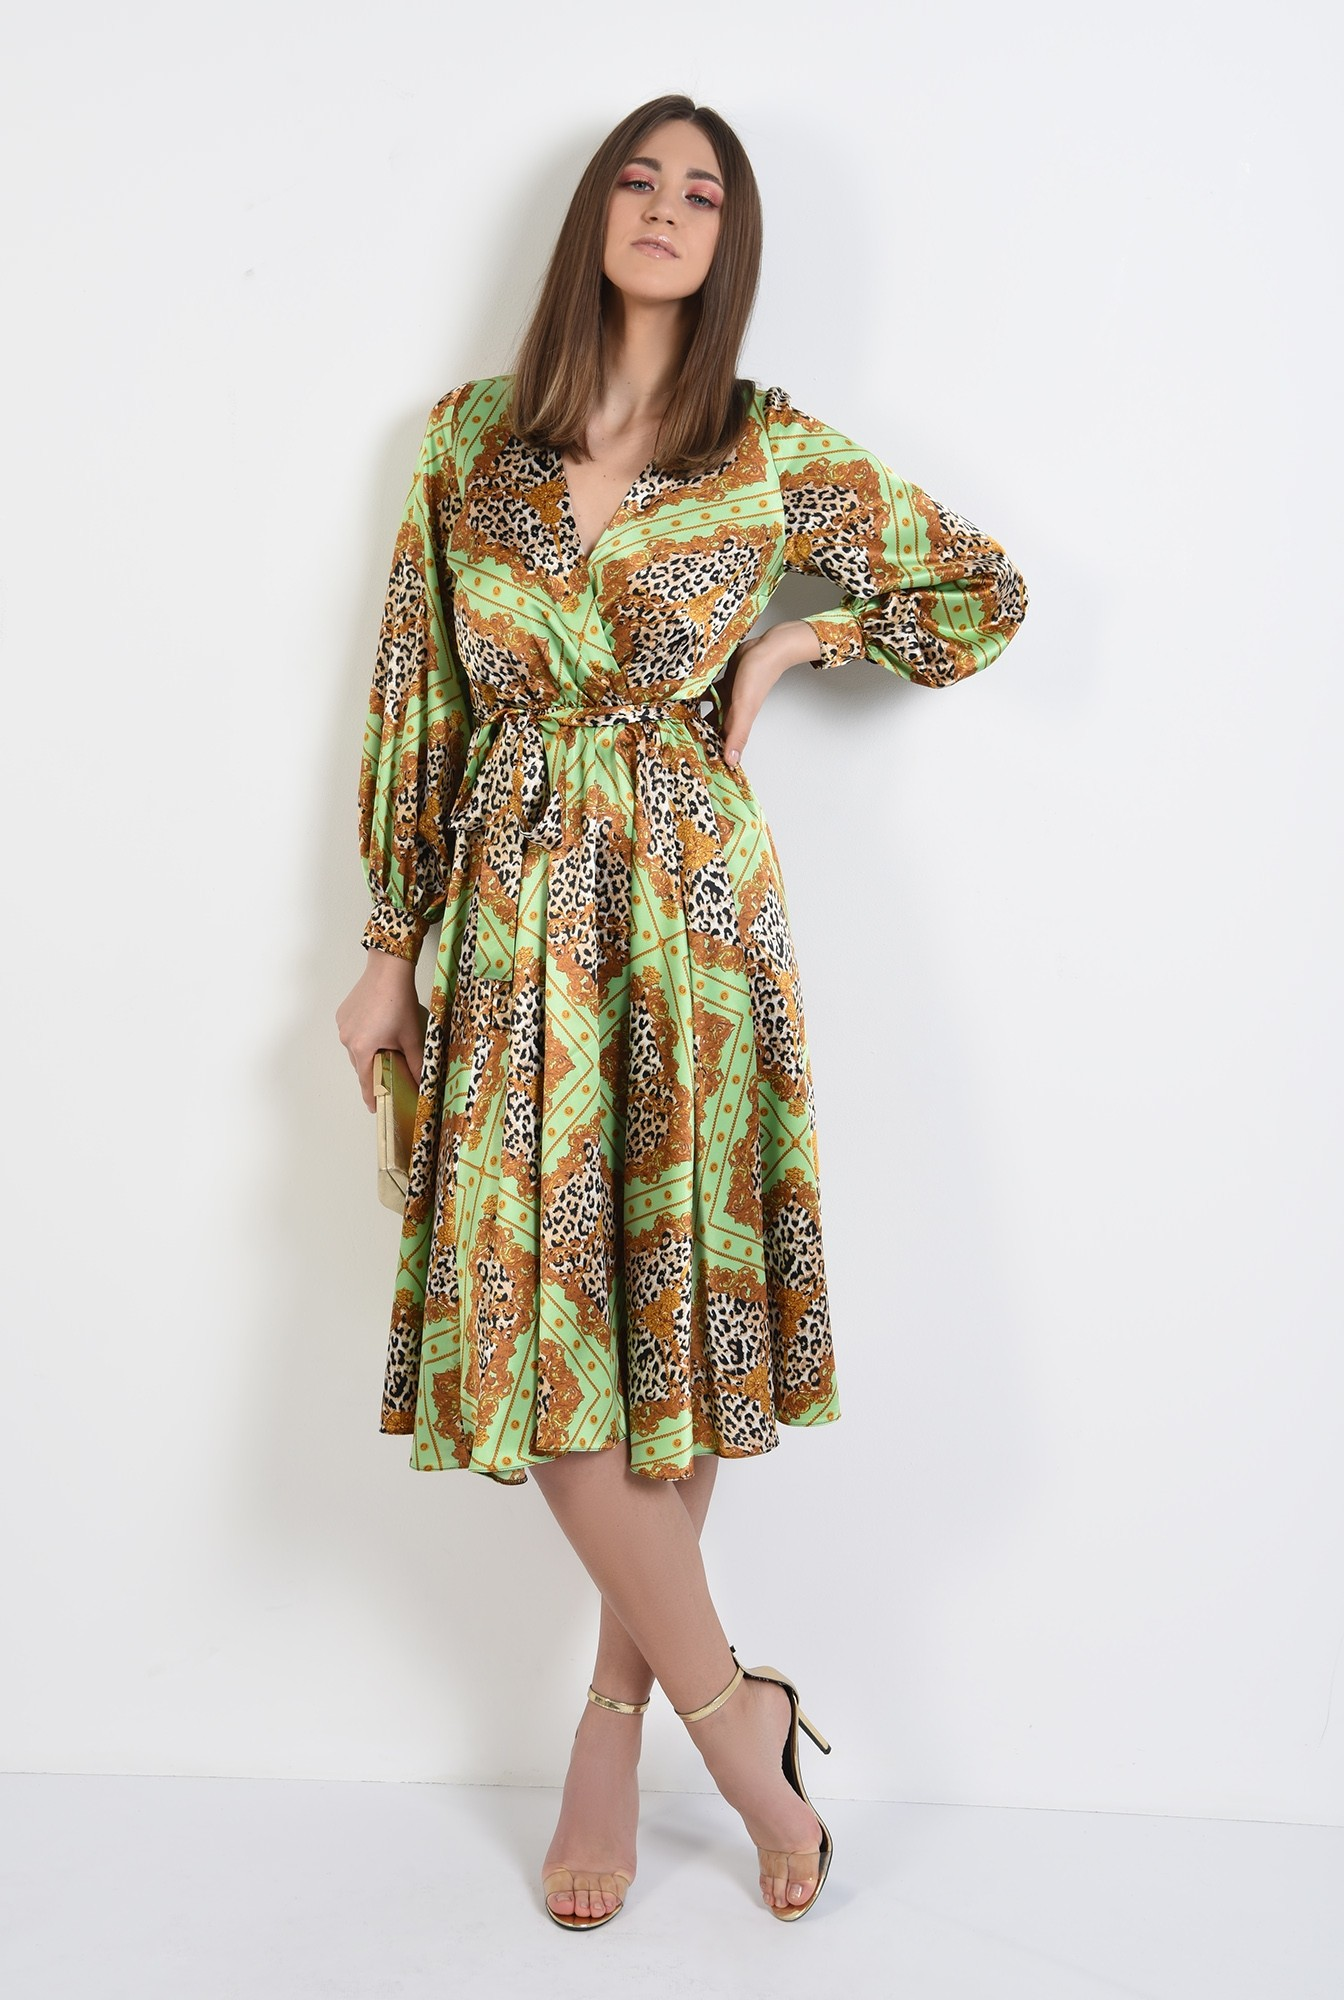 3 - 360 - rochie eleganta, din satin, cu imprimeu, maneci bufante, clos, animal print